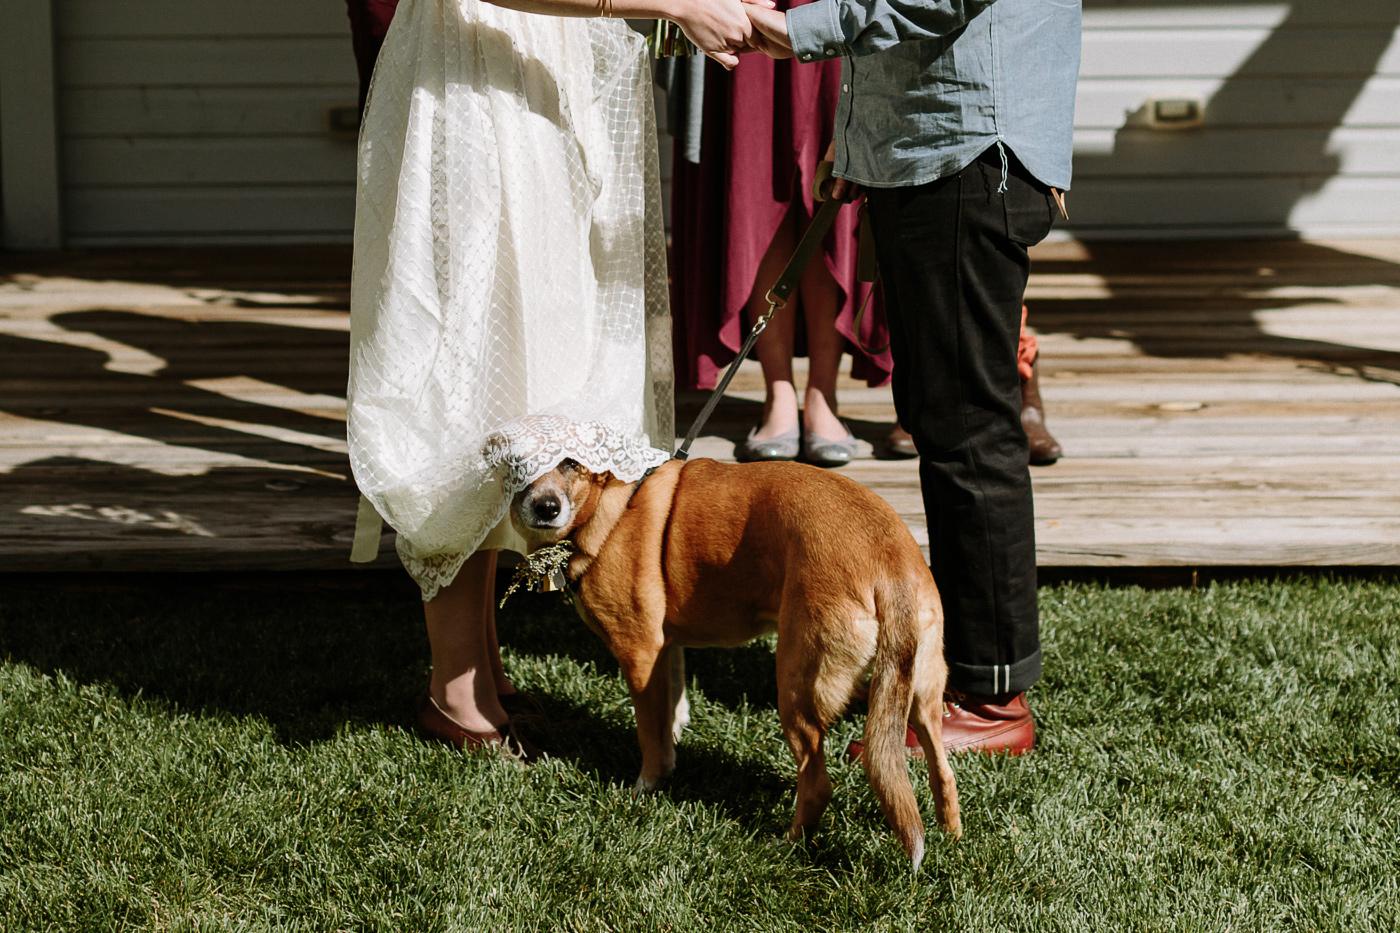 Dog under wedding dress during ceremony